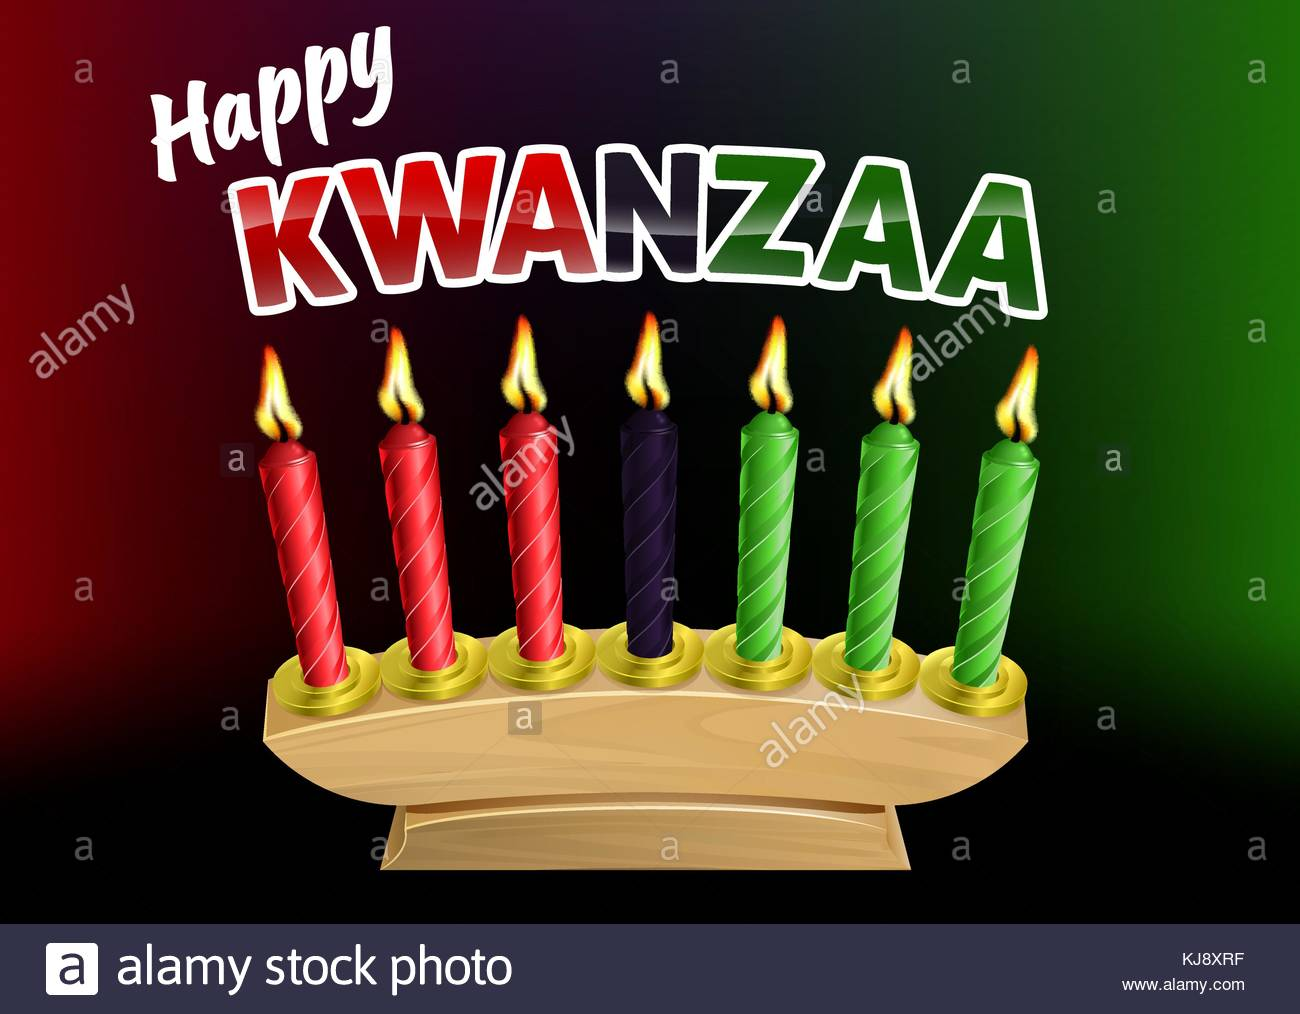 Happy Kwanzaa Candles Design Stock Vector Art Illustration 1300x1014